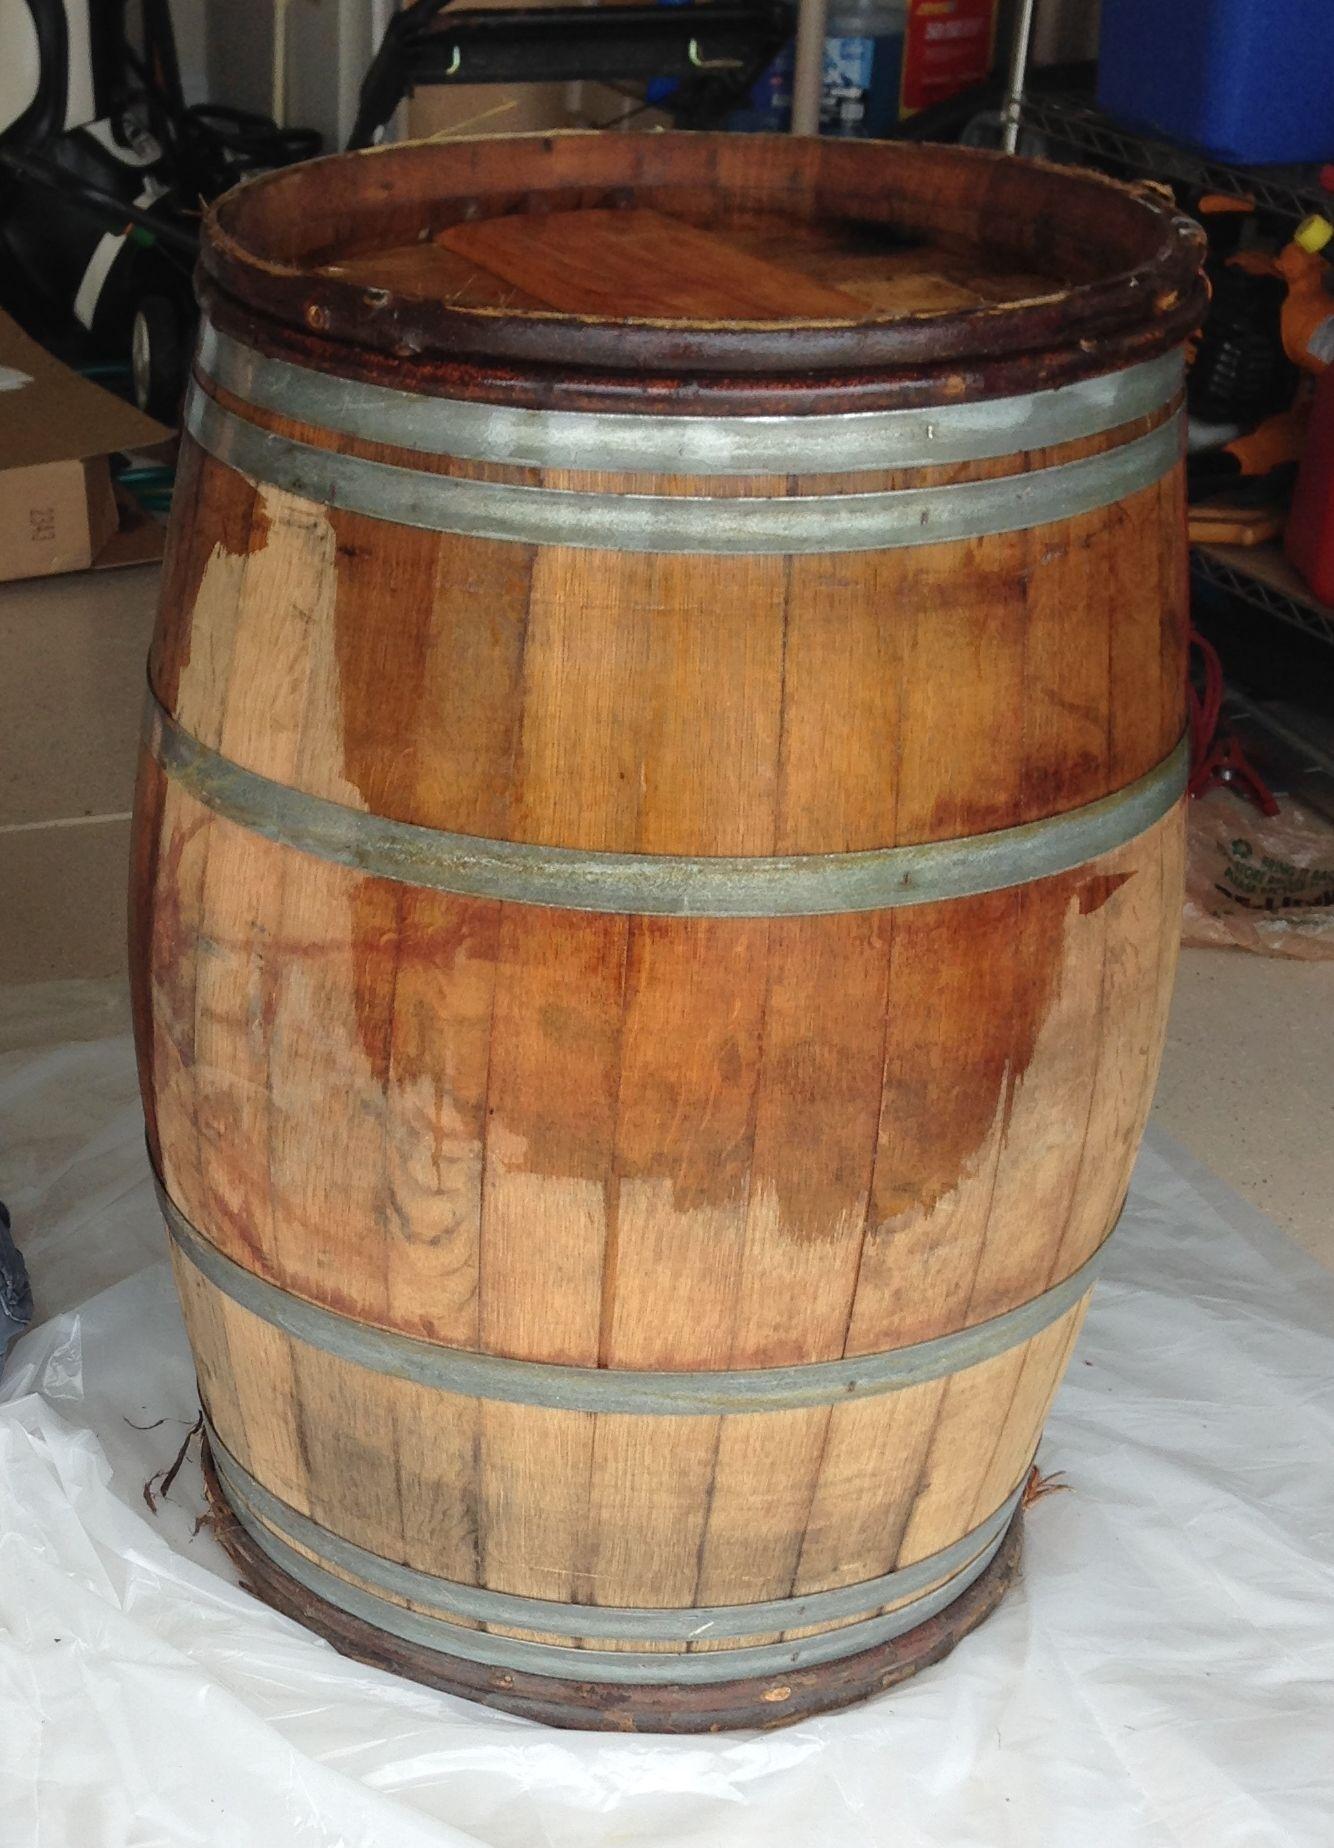 Adding A Clear Coat Of A Satin Polyurethane Sealant To The Wine Barrel Wine Room Wine Barrel Whiskey Barrel